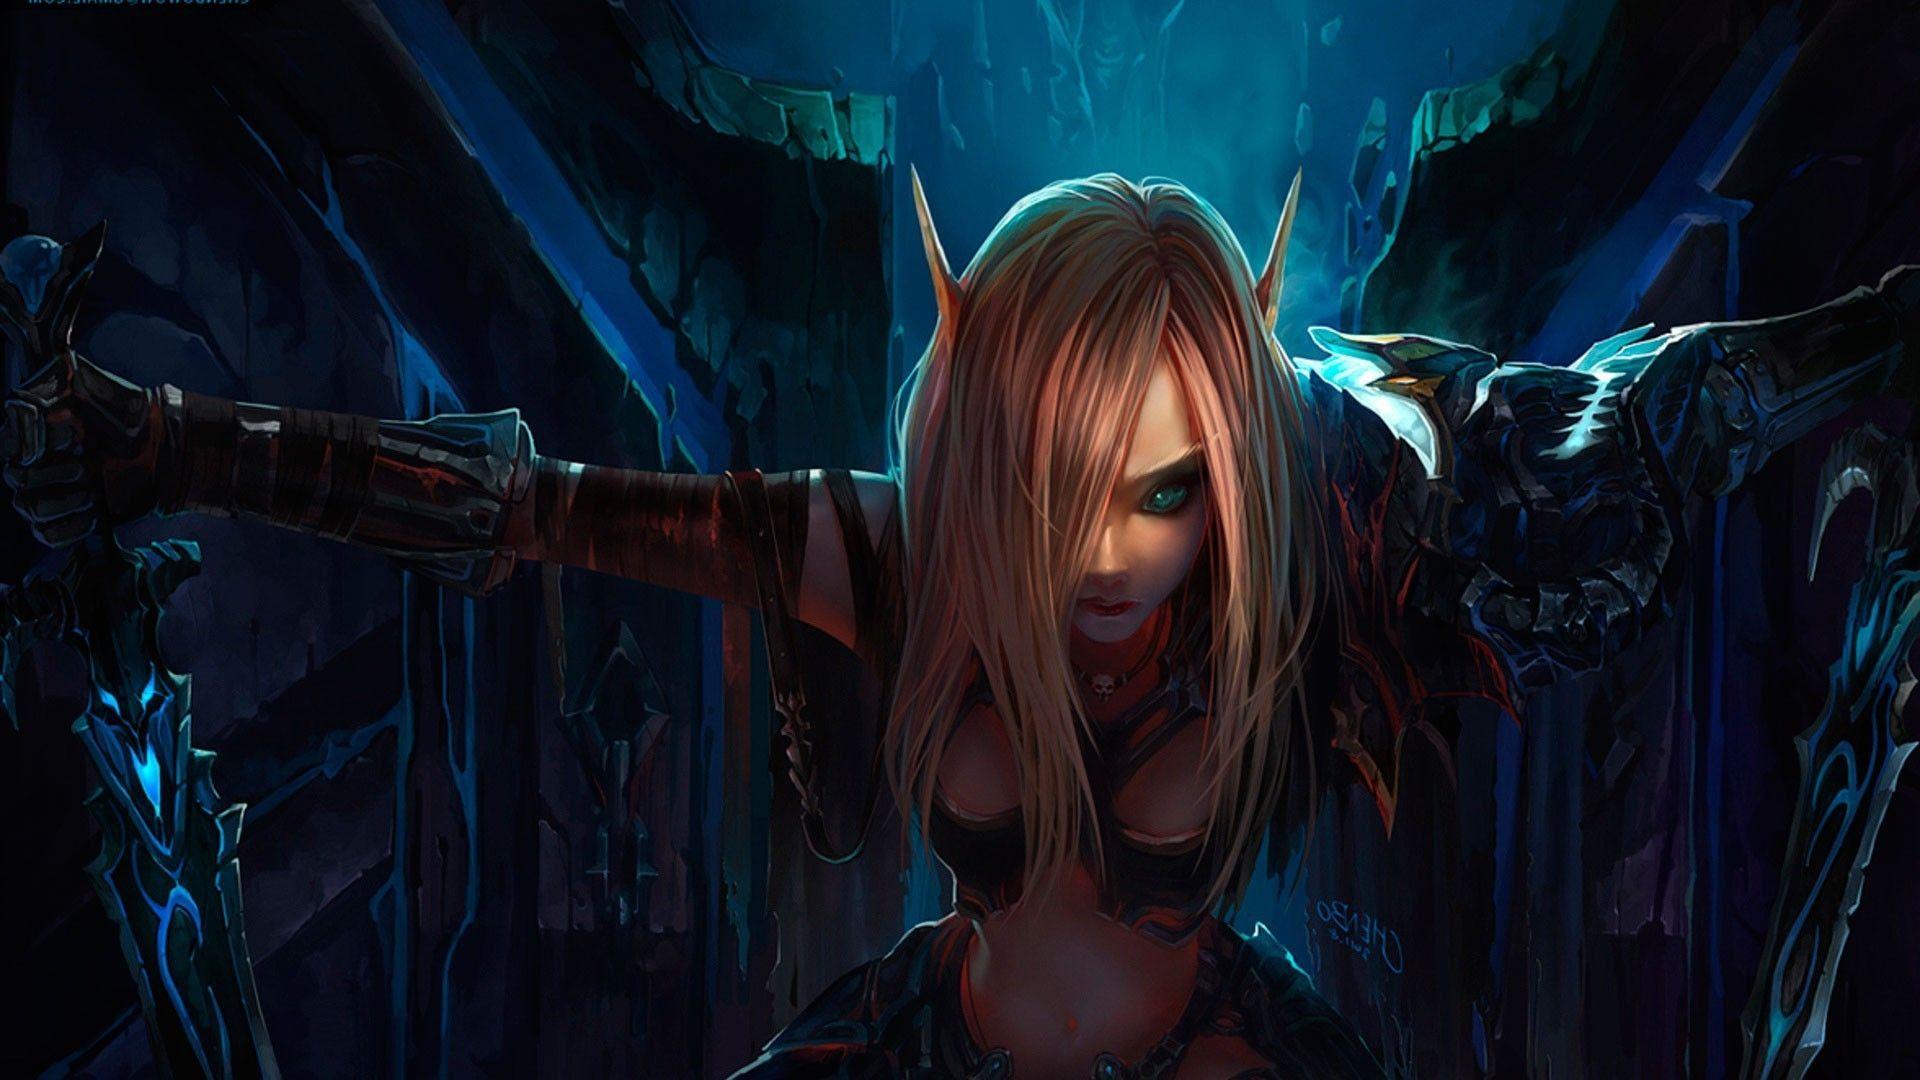 Wallpaper warrior axe wow Orc axe world of warcraft warrior